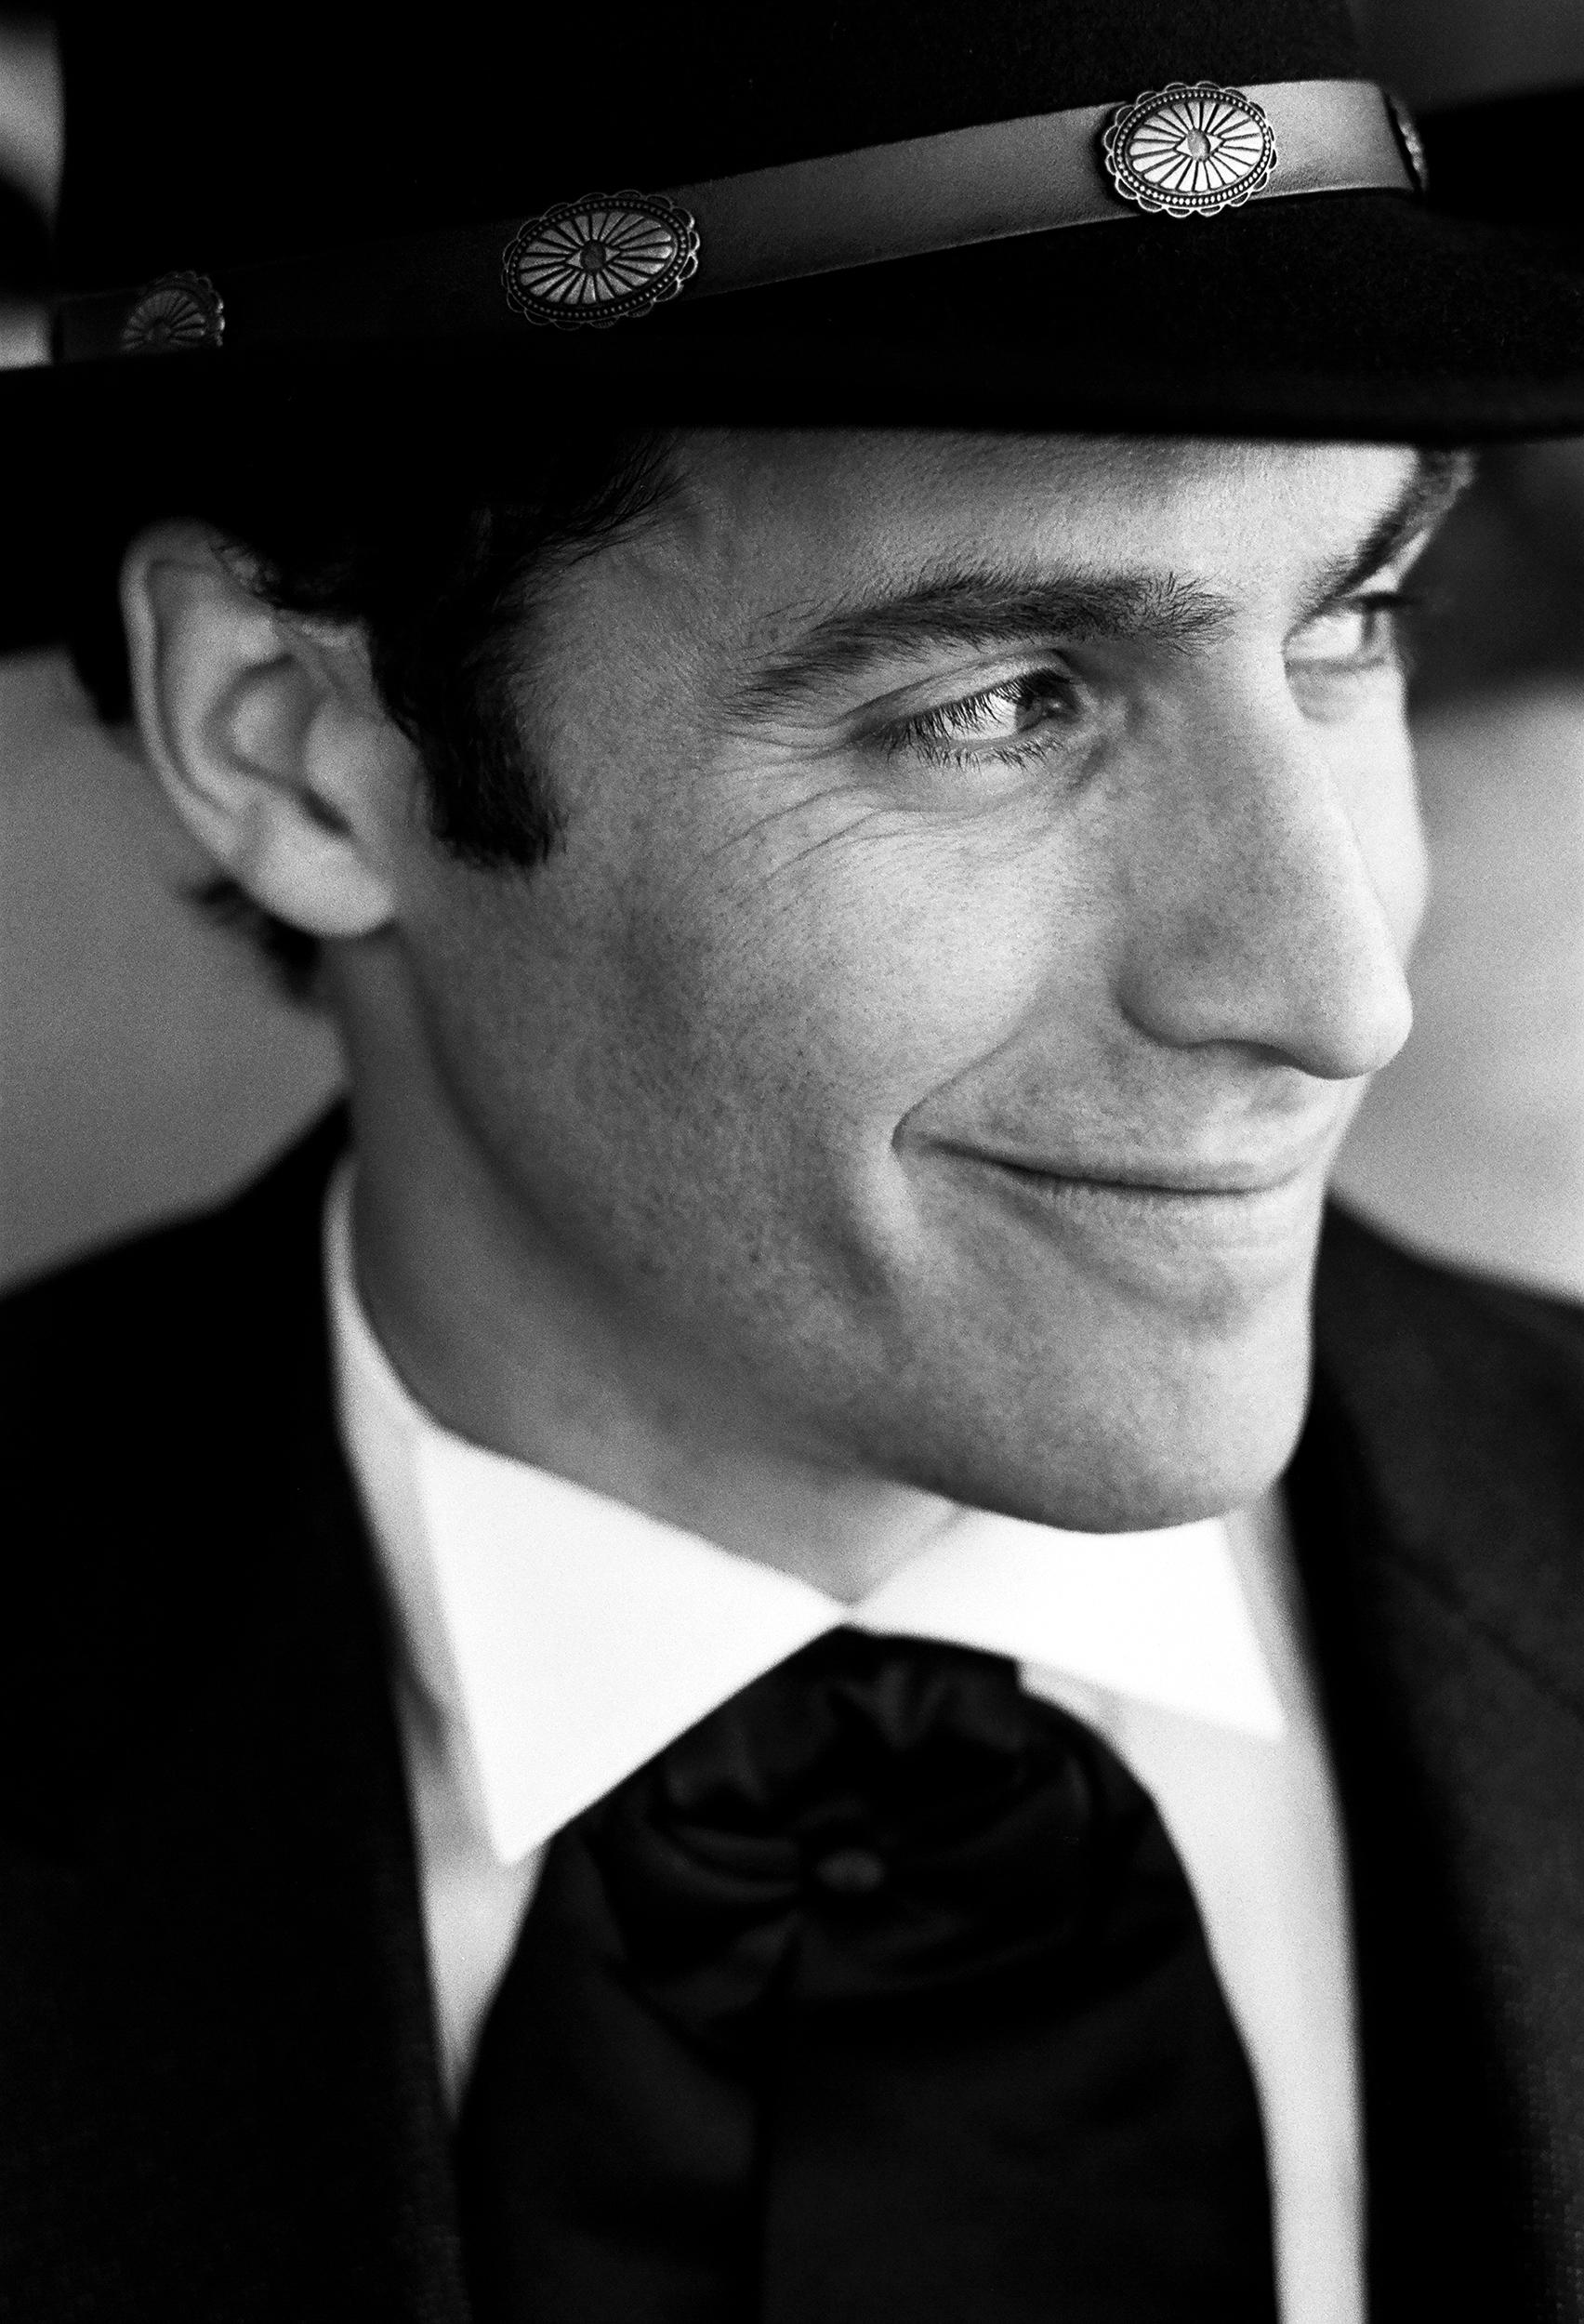 WEB_BW Handsome Man.jpg